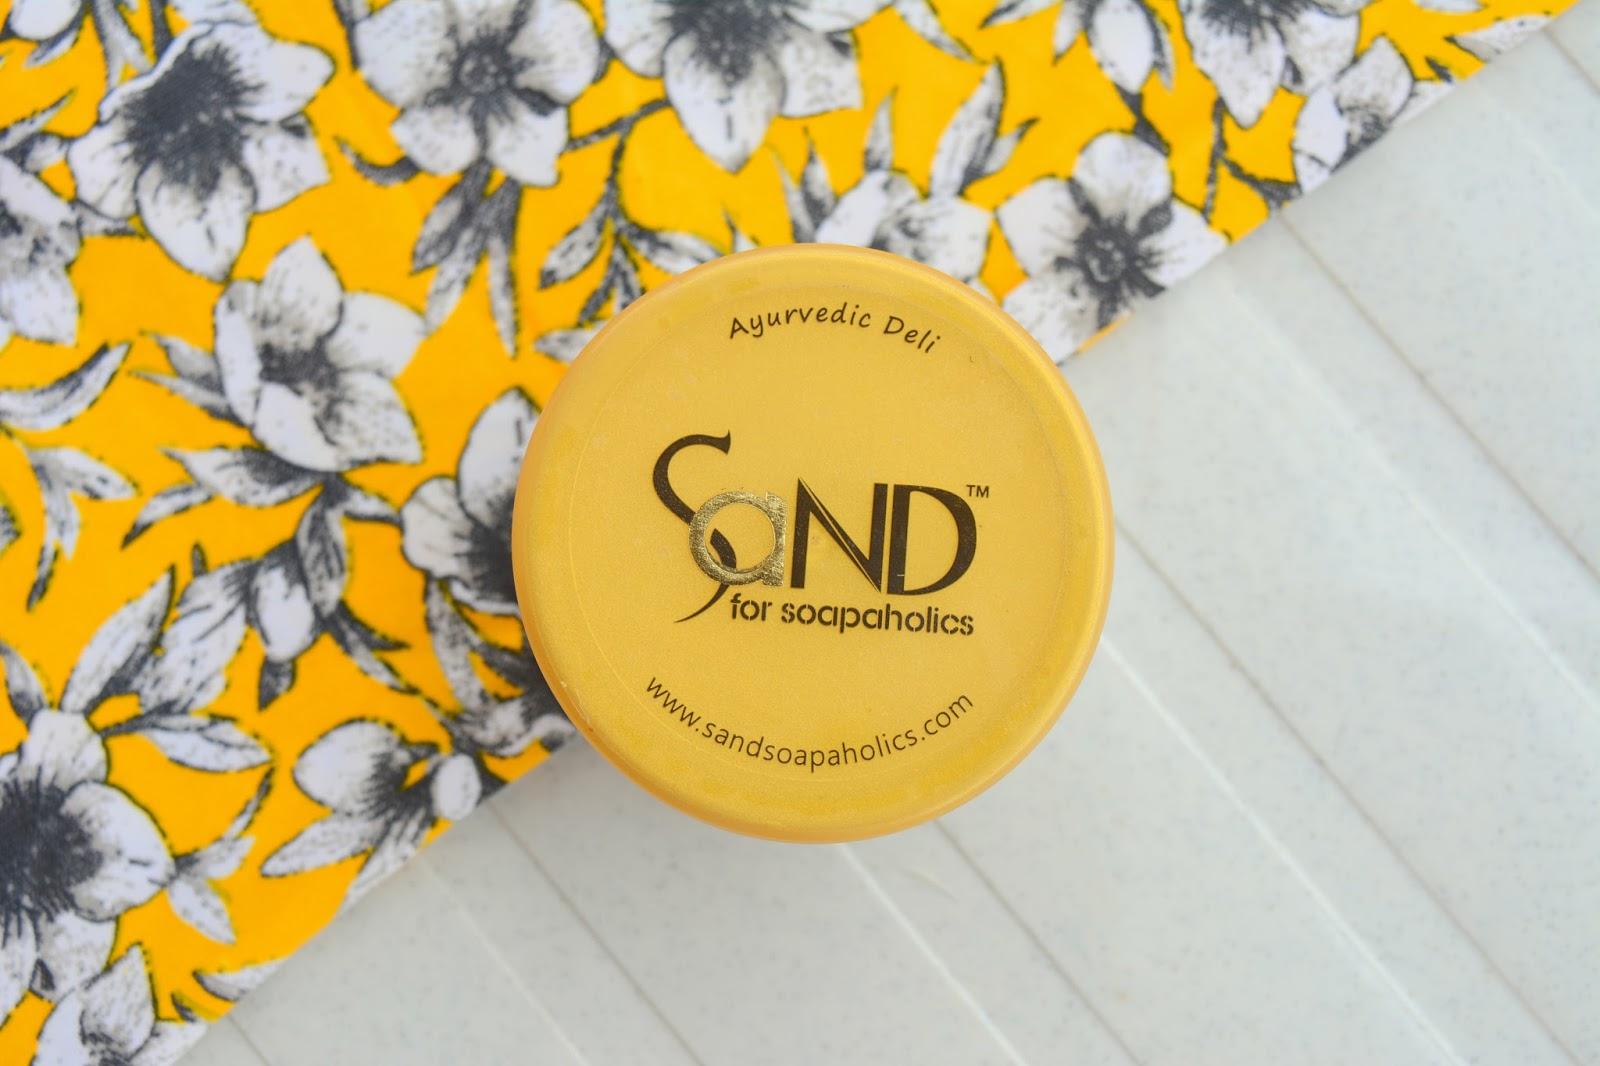 SaND for Soapaholics 'Lal Kela' Hair Mask Review